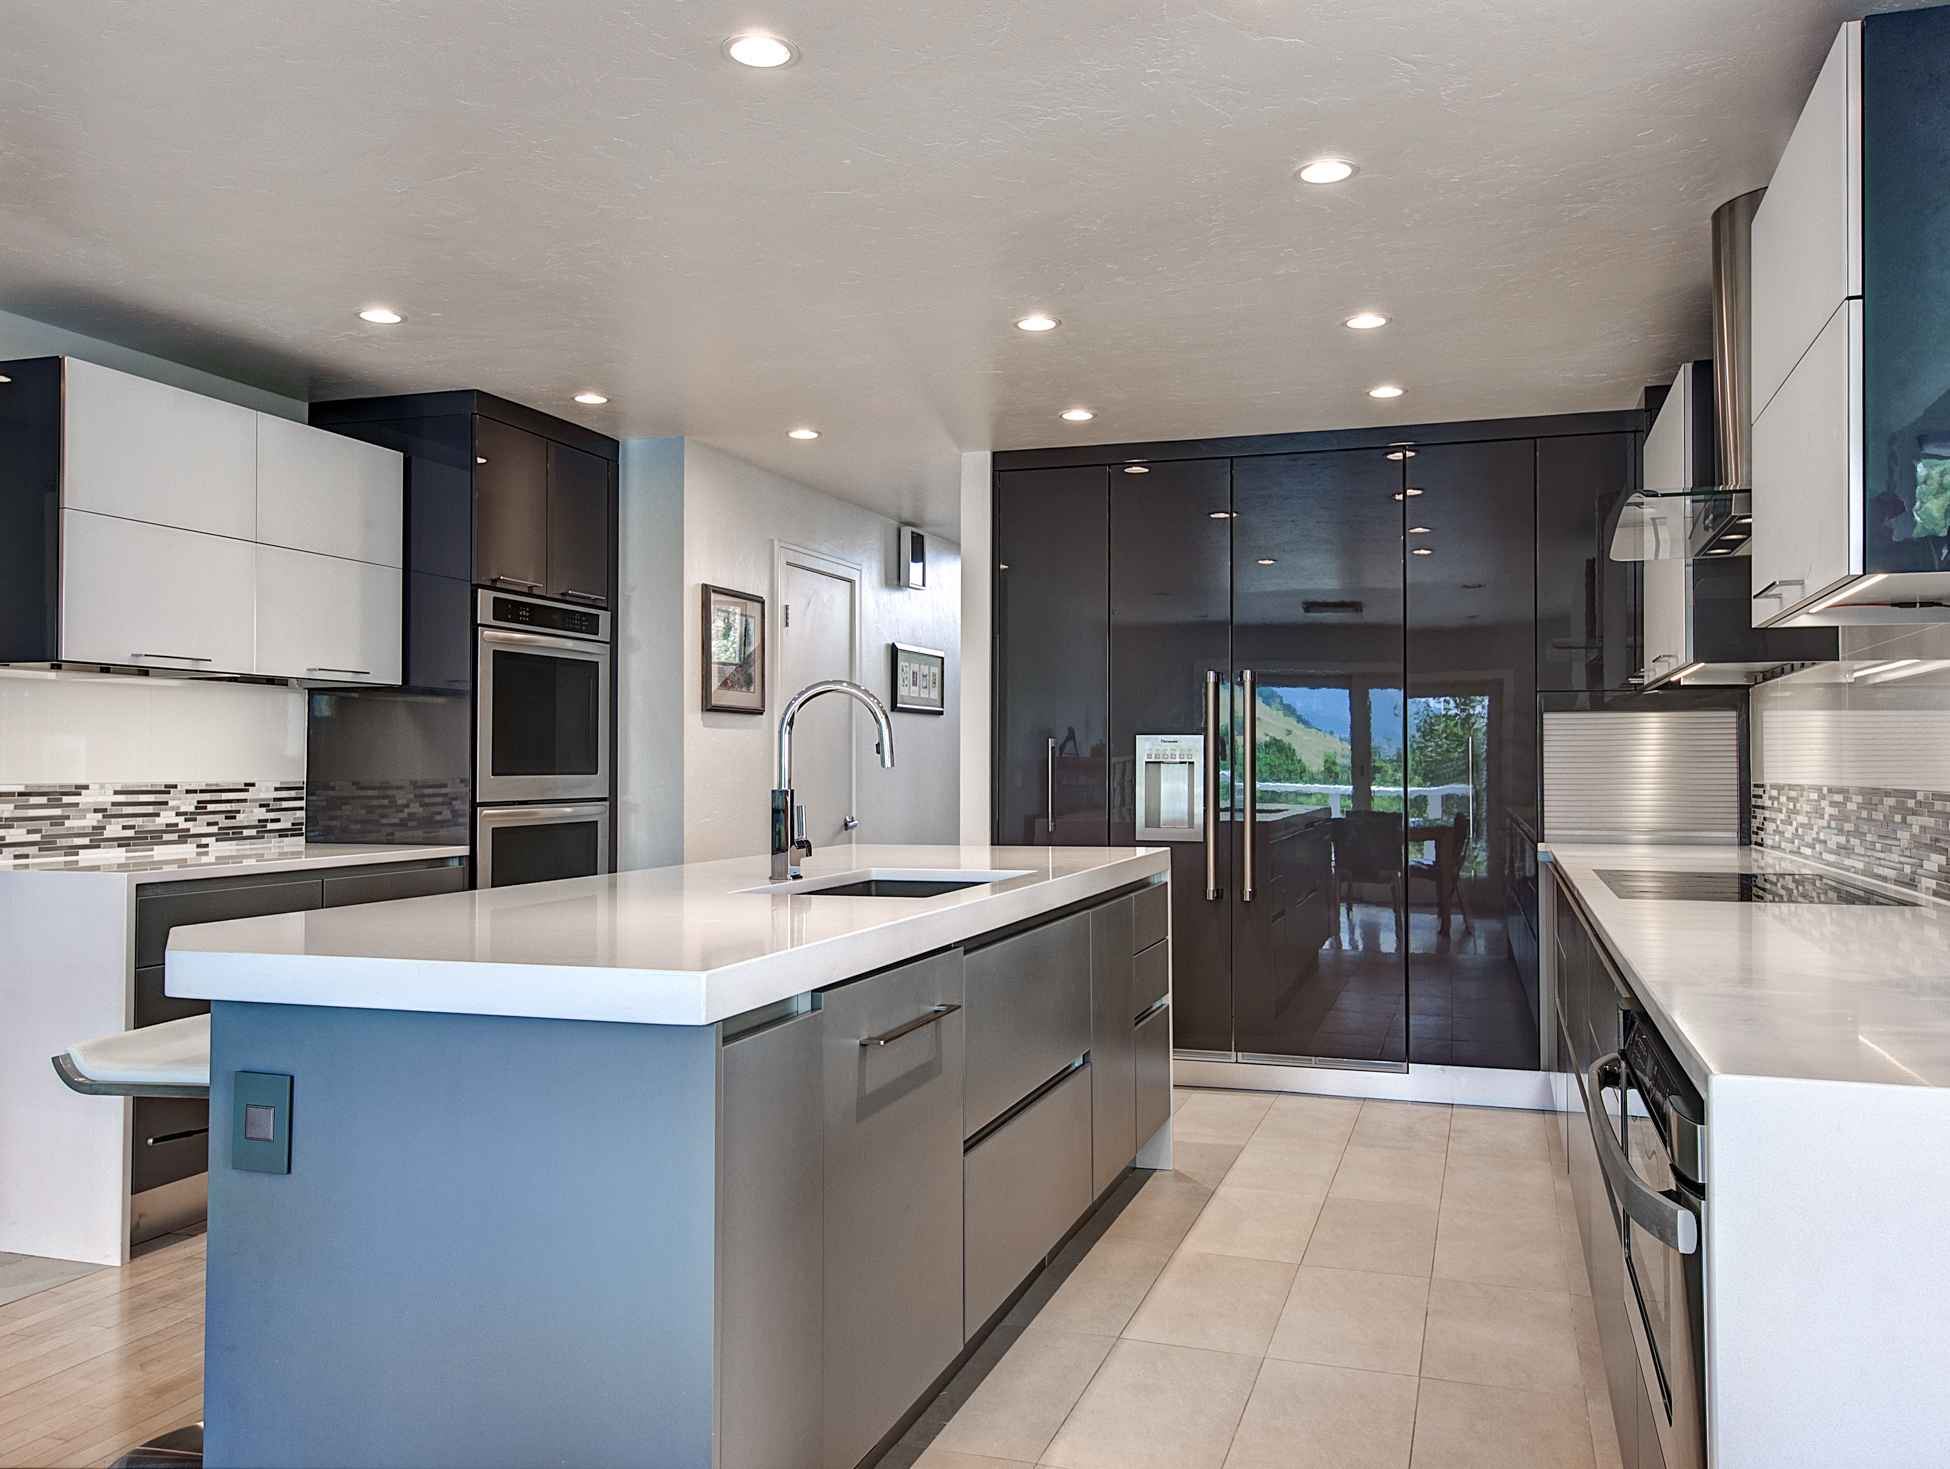 boulder modern — sanctuary kitchen and bath design-3.jpg